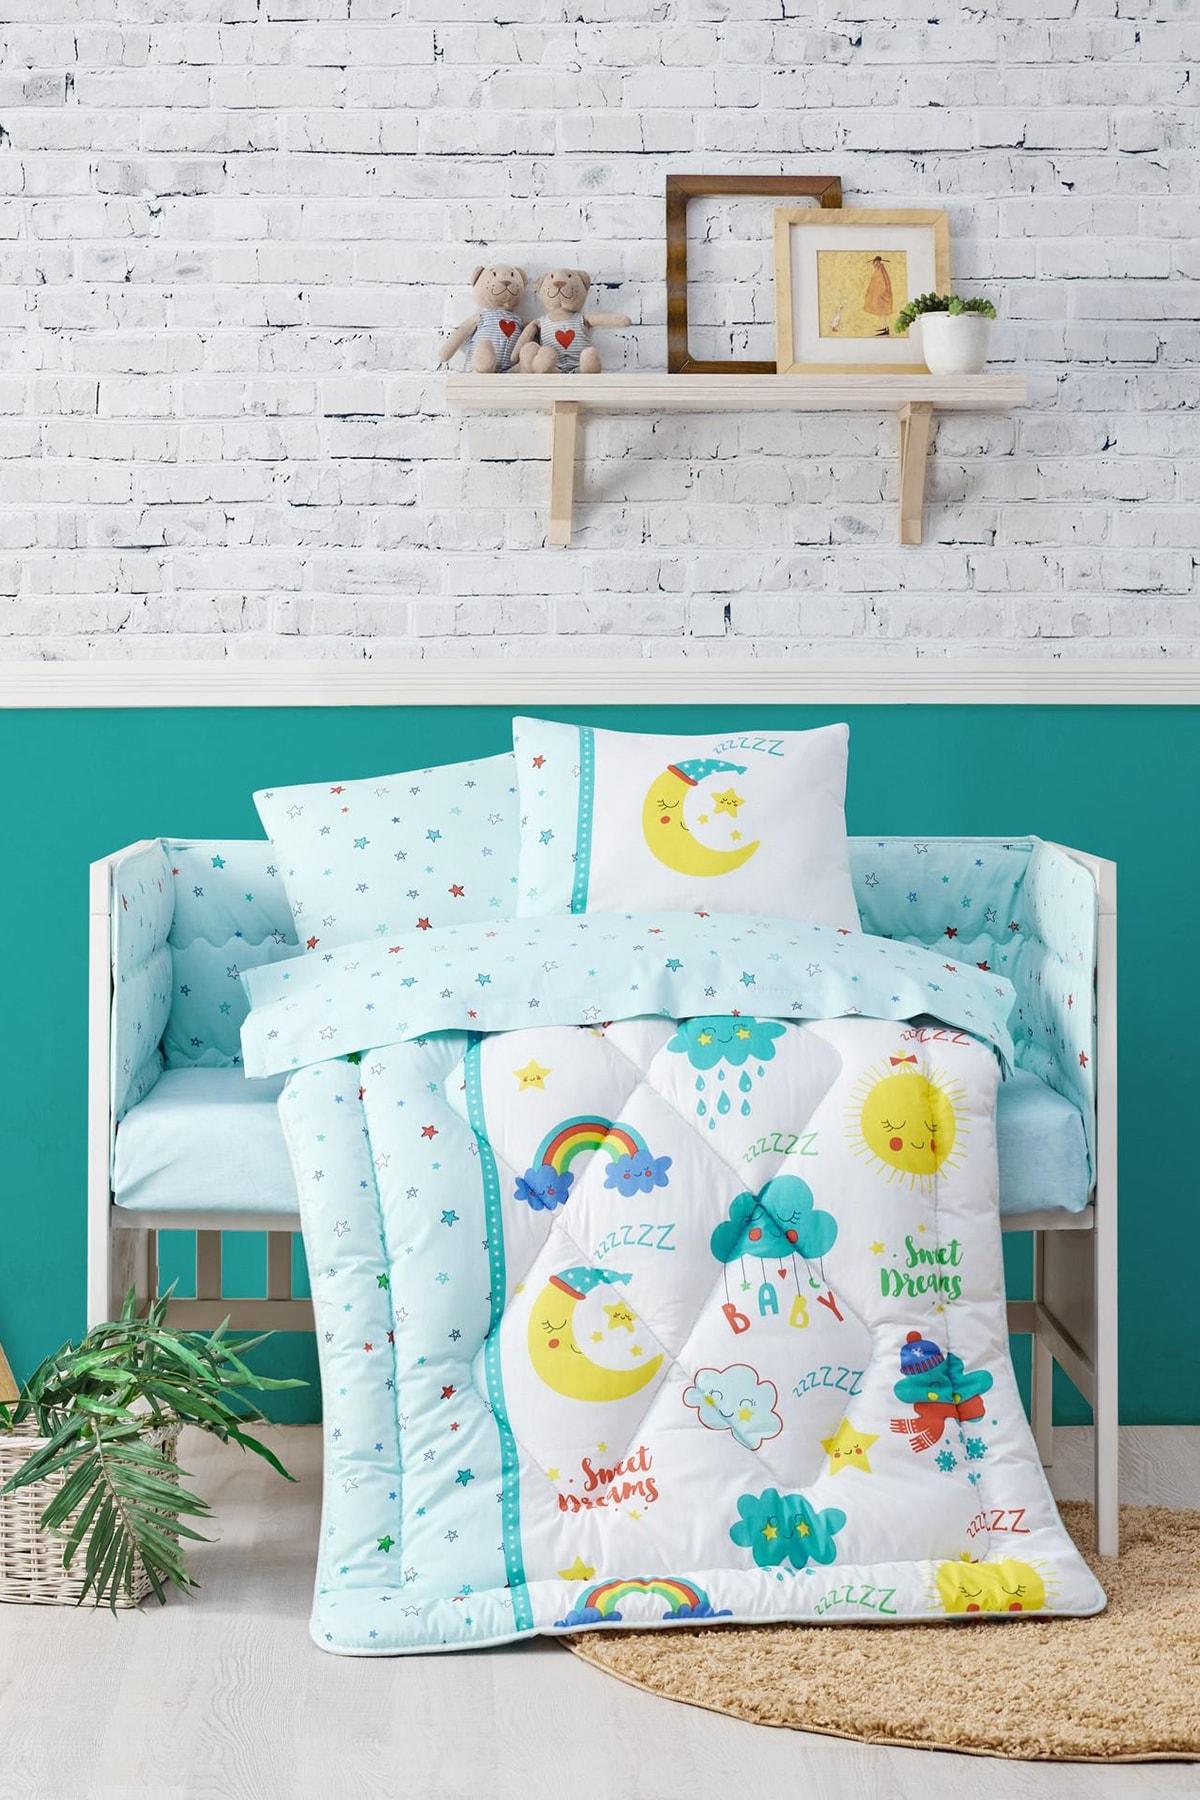 Cotton Box Bebek Uyku Seti Tatlı Rüyalar Mint